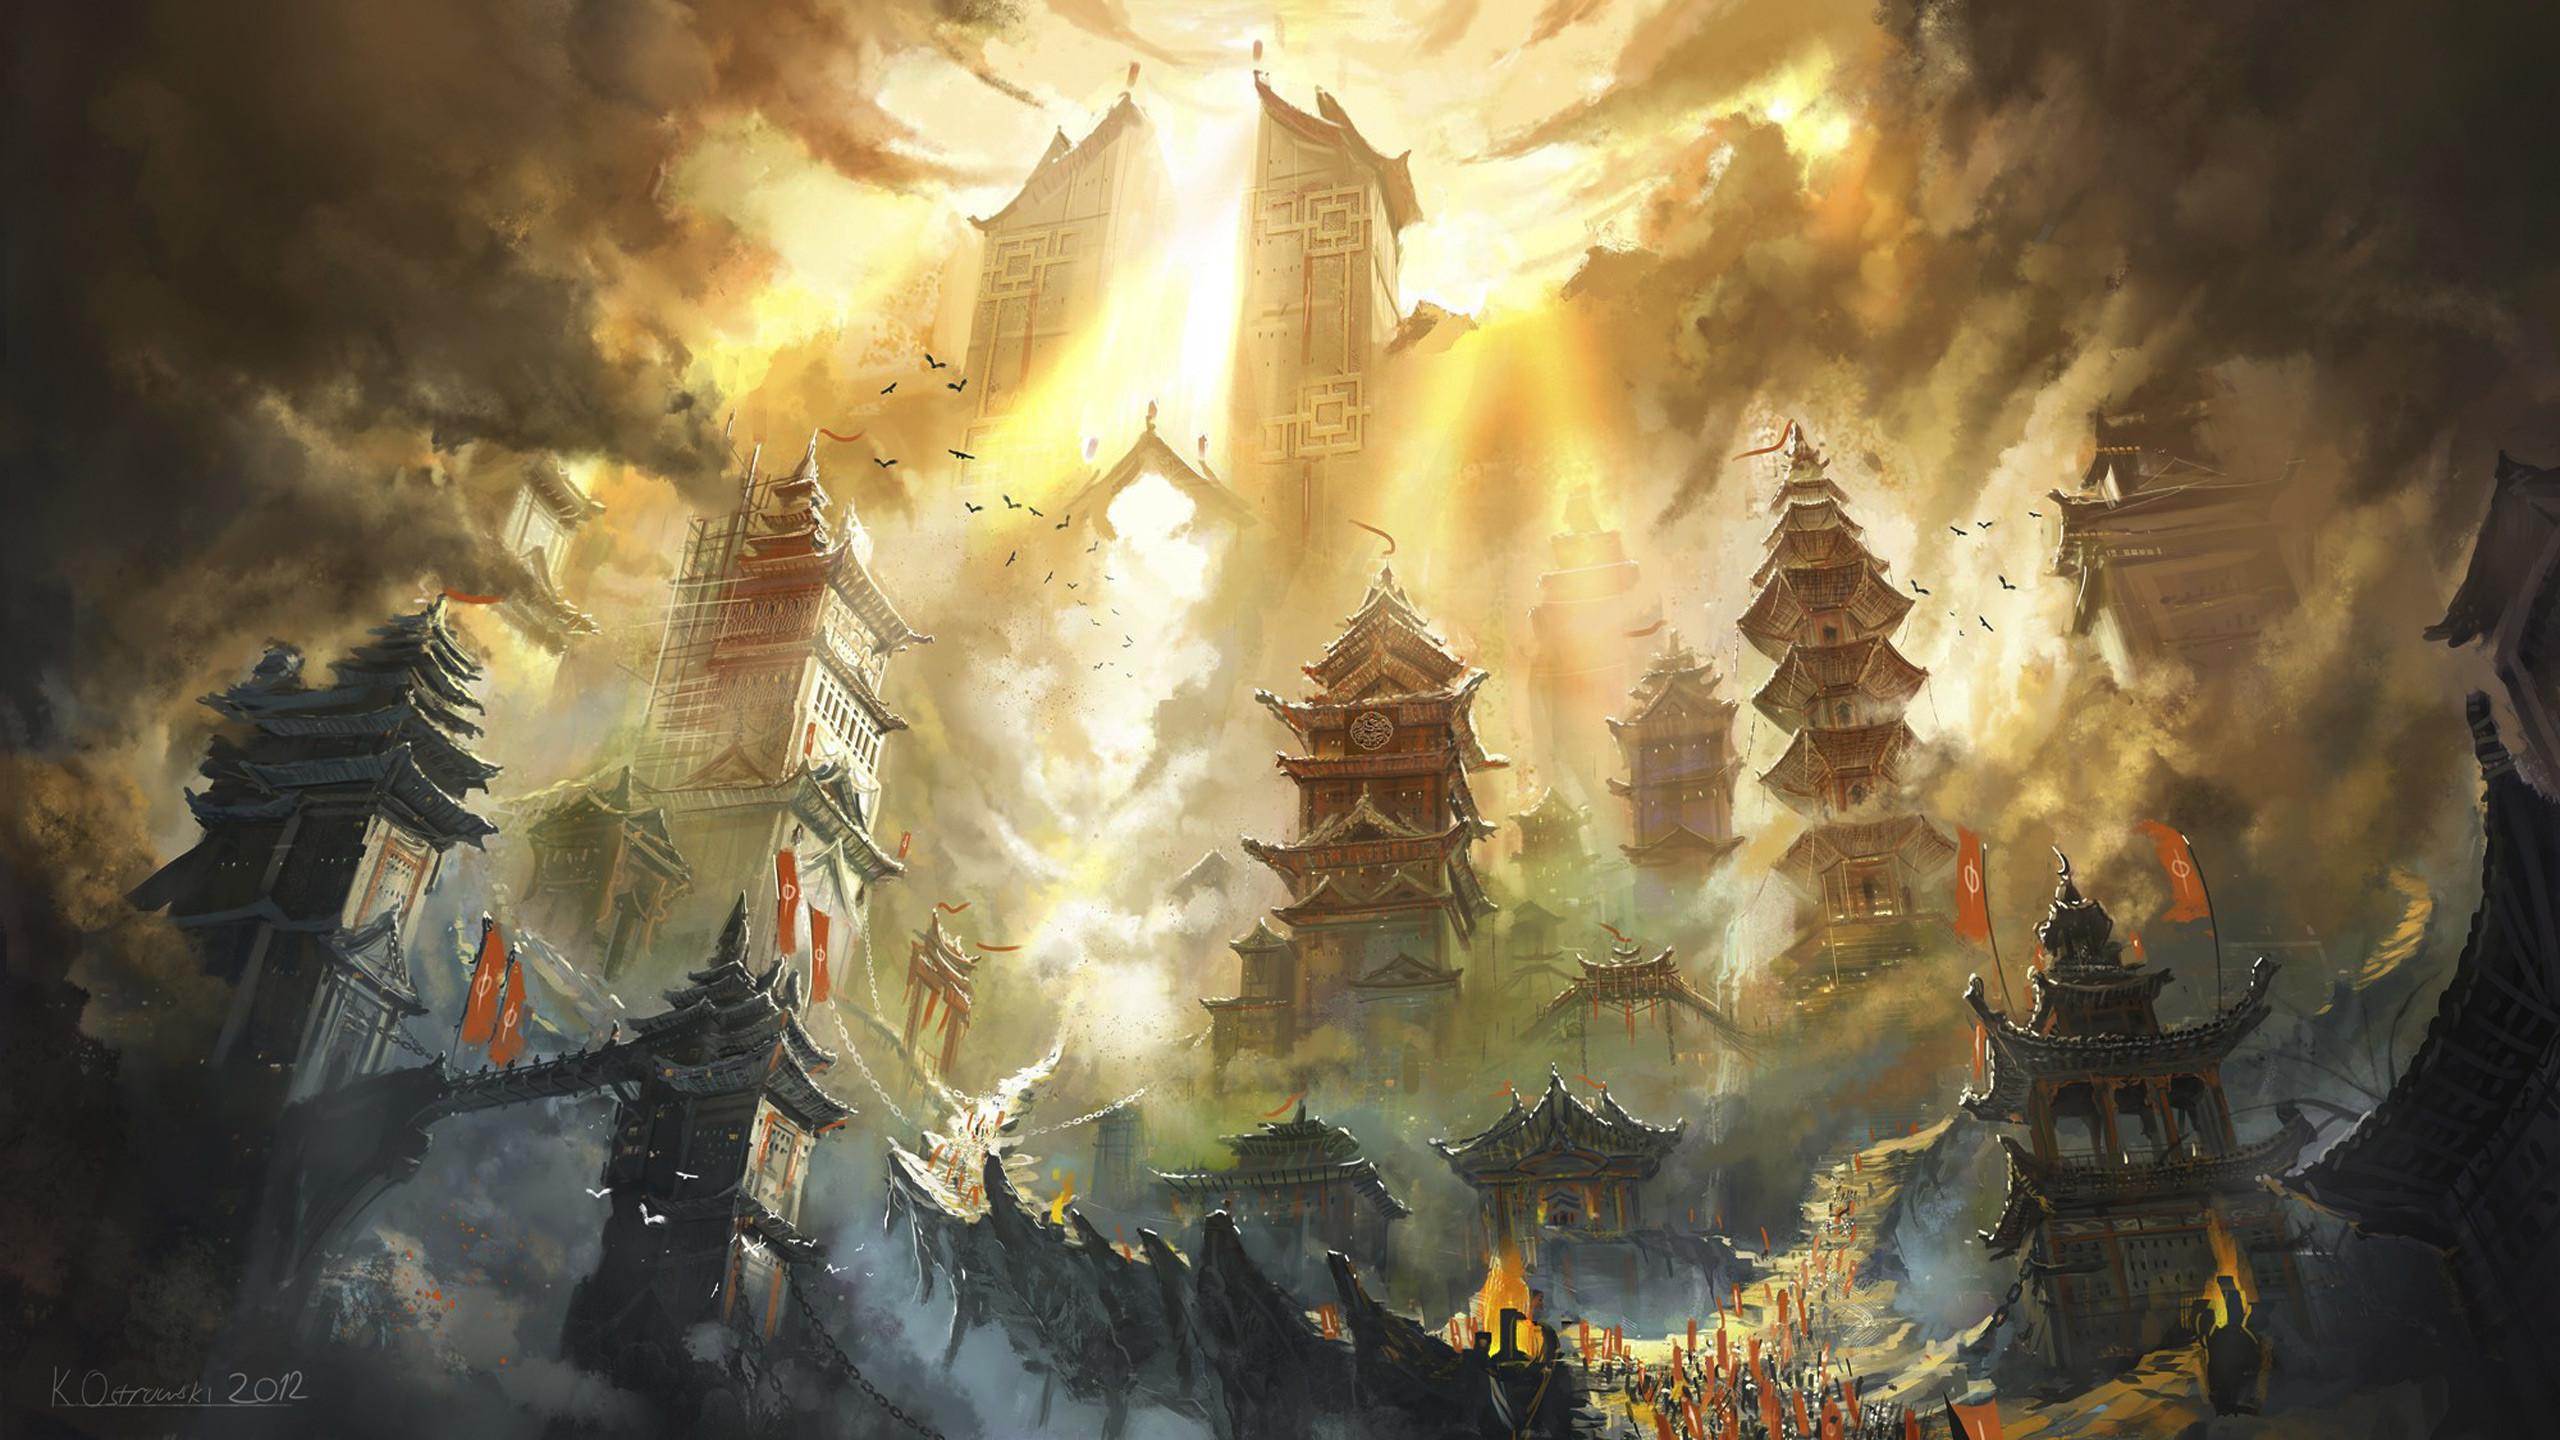 Res: 2560x1440, Free Anime Fantasy Landscape, computer desktop wallpapers, pictures, images